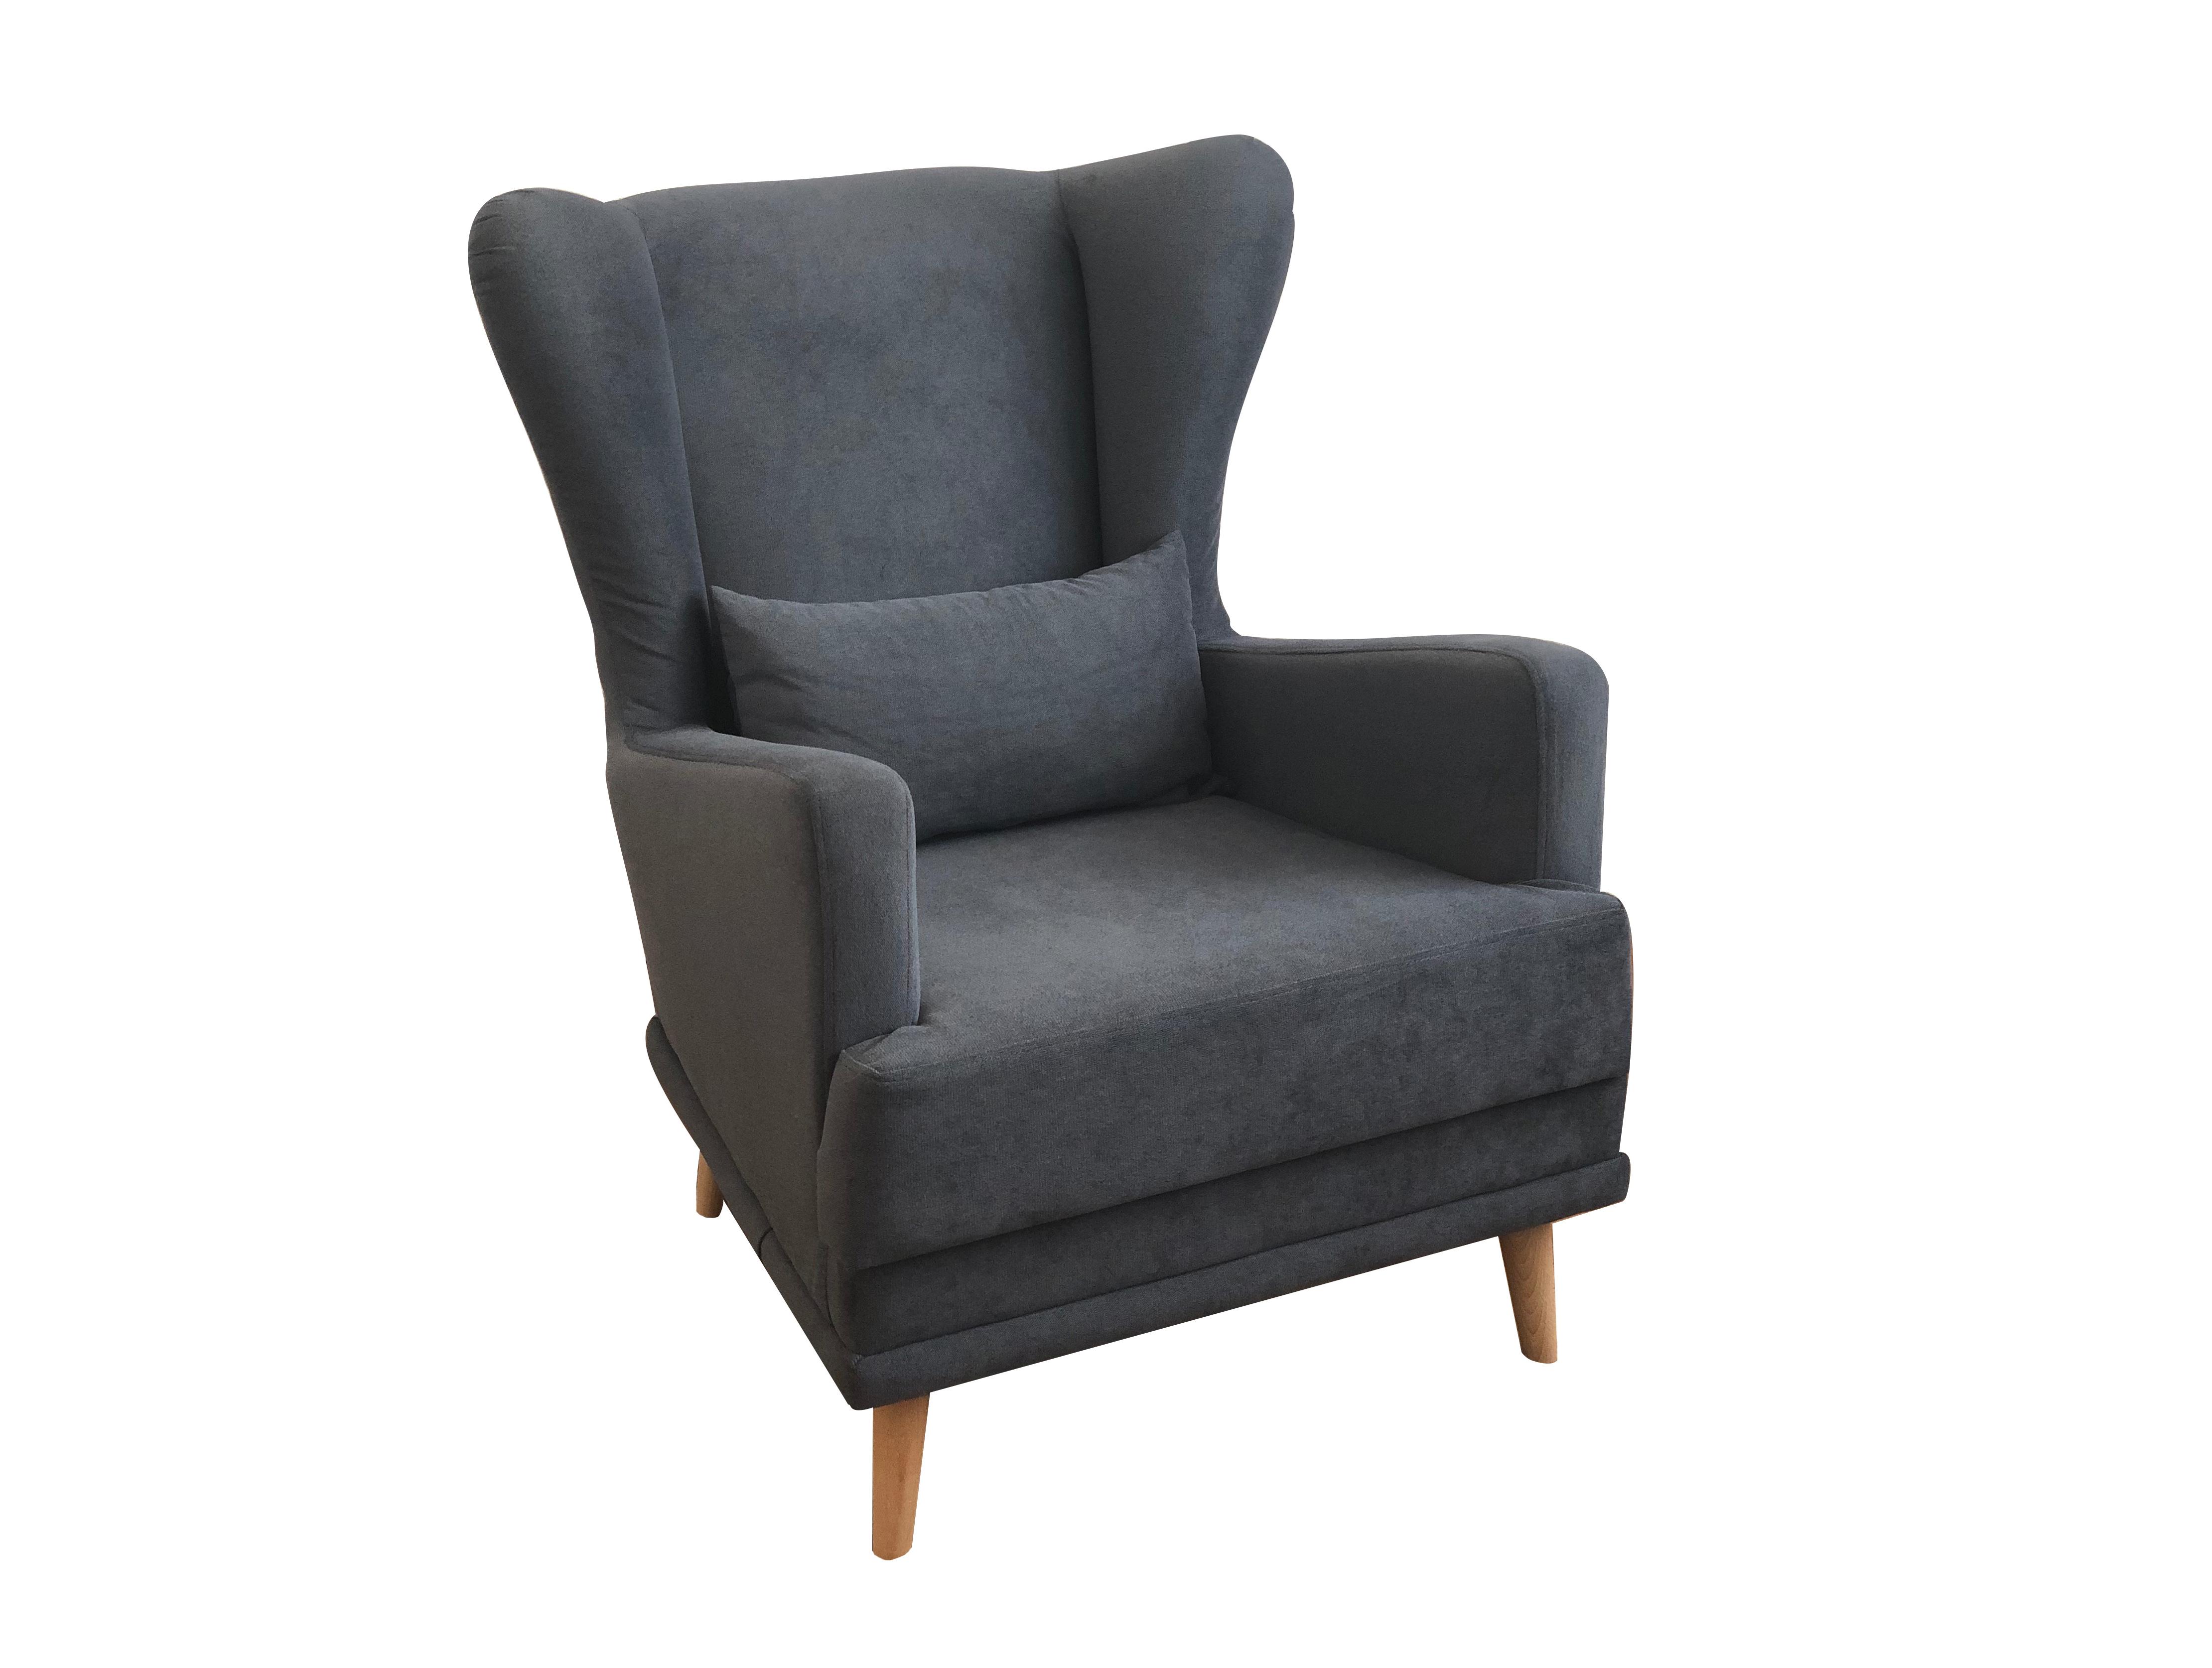 Подвесное кресло Sofa 16286939 от mebel-top.ru